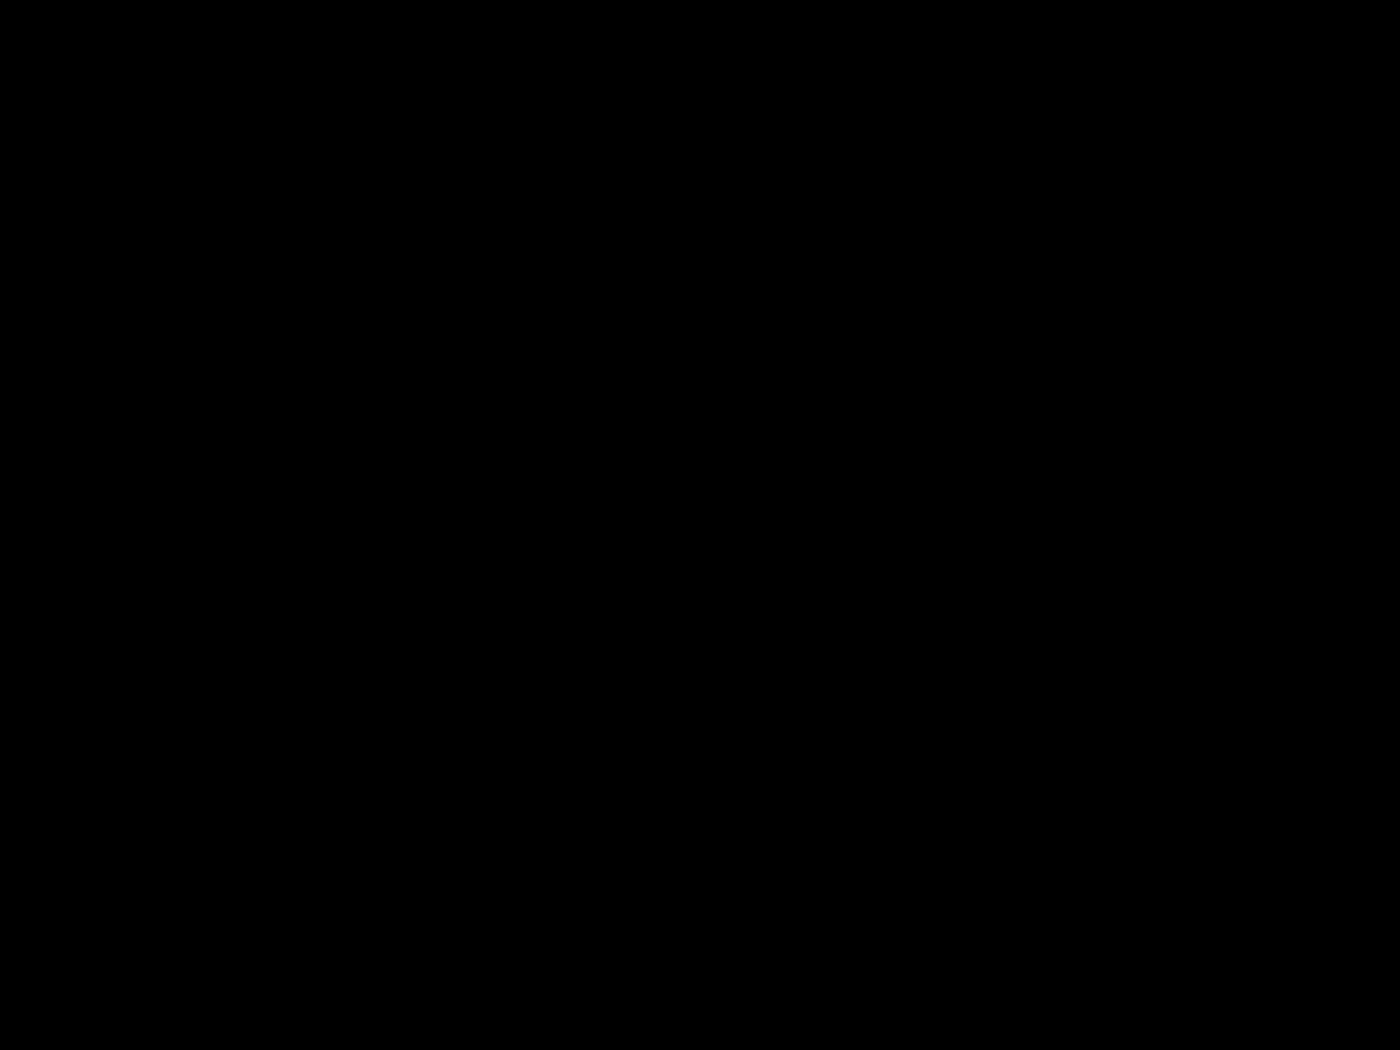 1400x1050 Black Solid Color Background